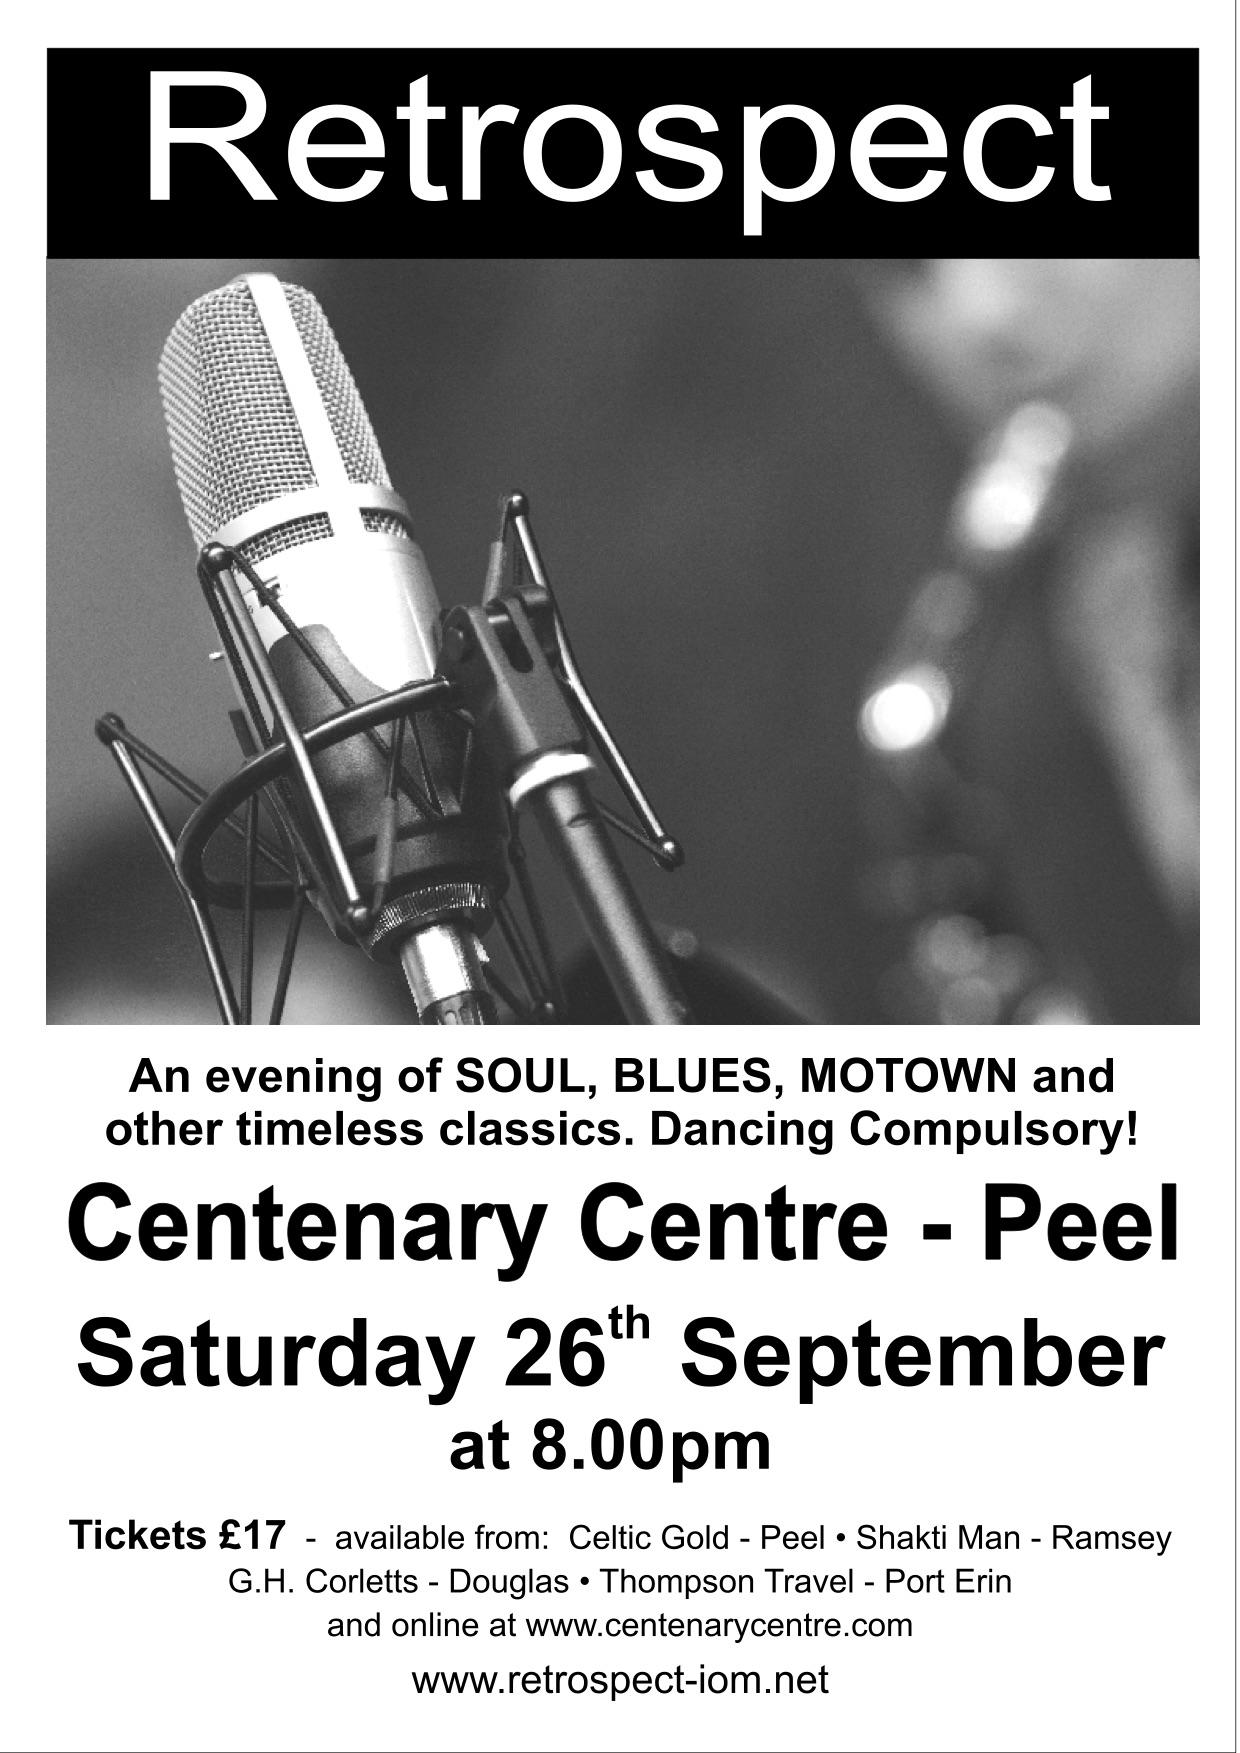 Retrospect LIVE! (SOLD OUT) @ Centenary Centre